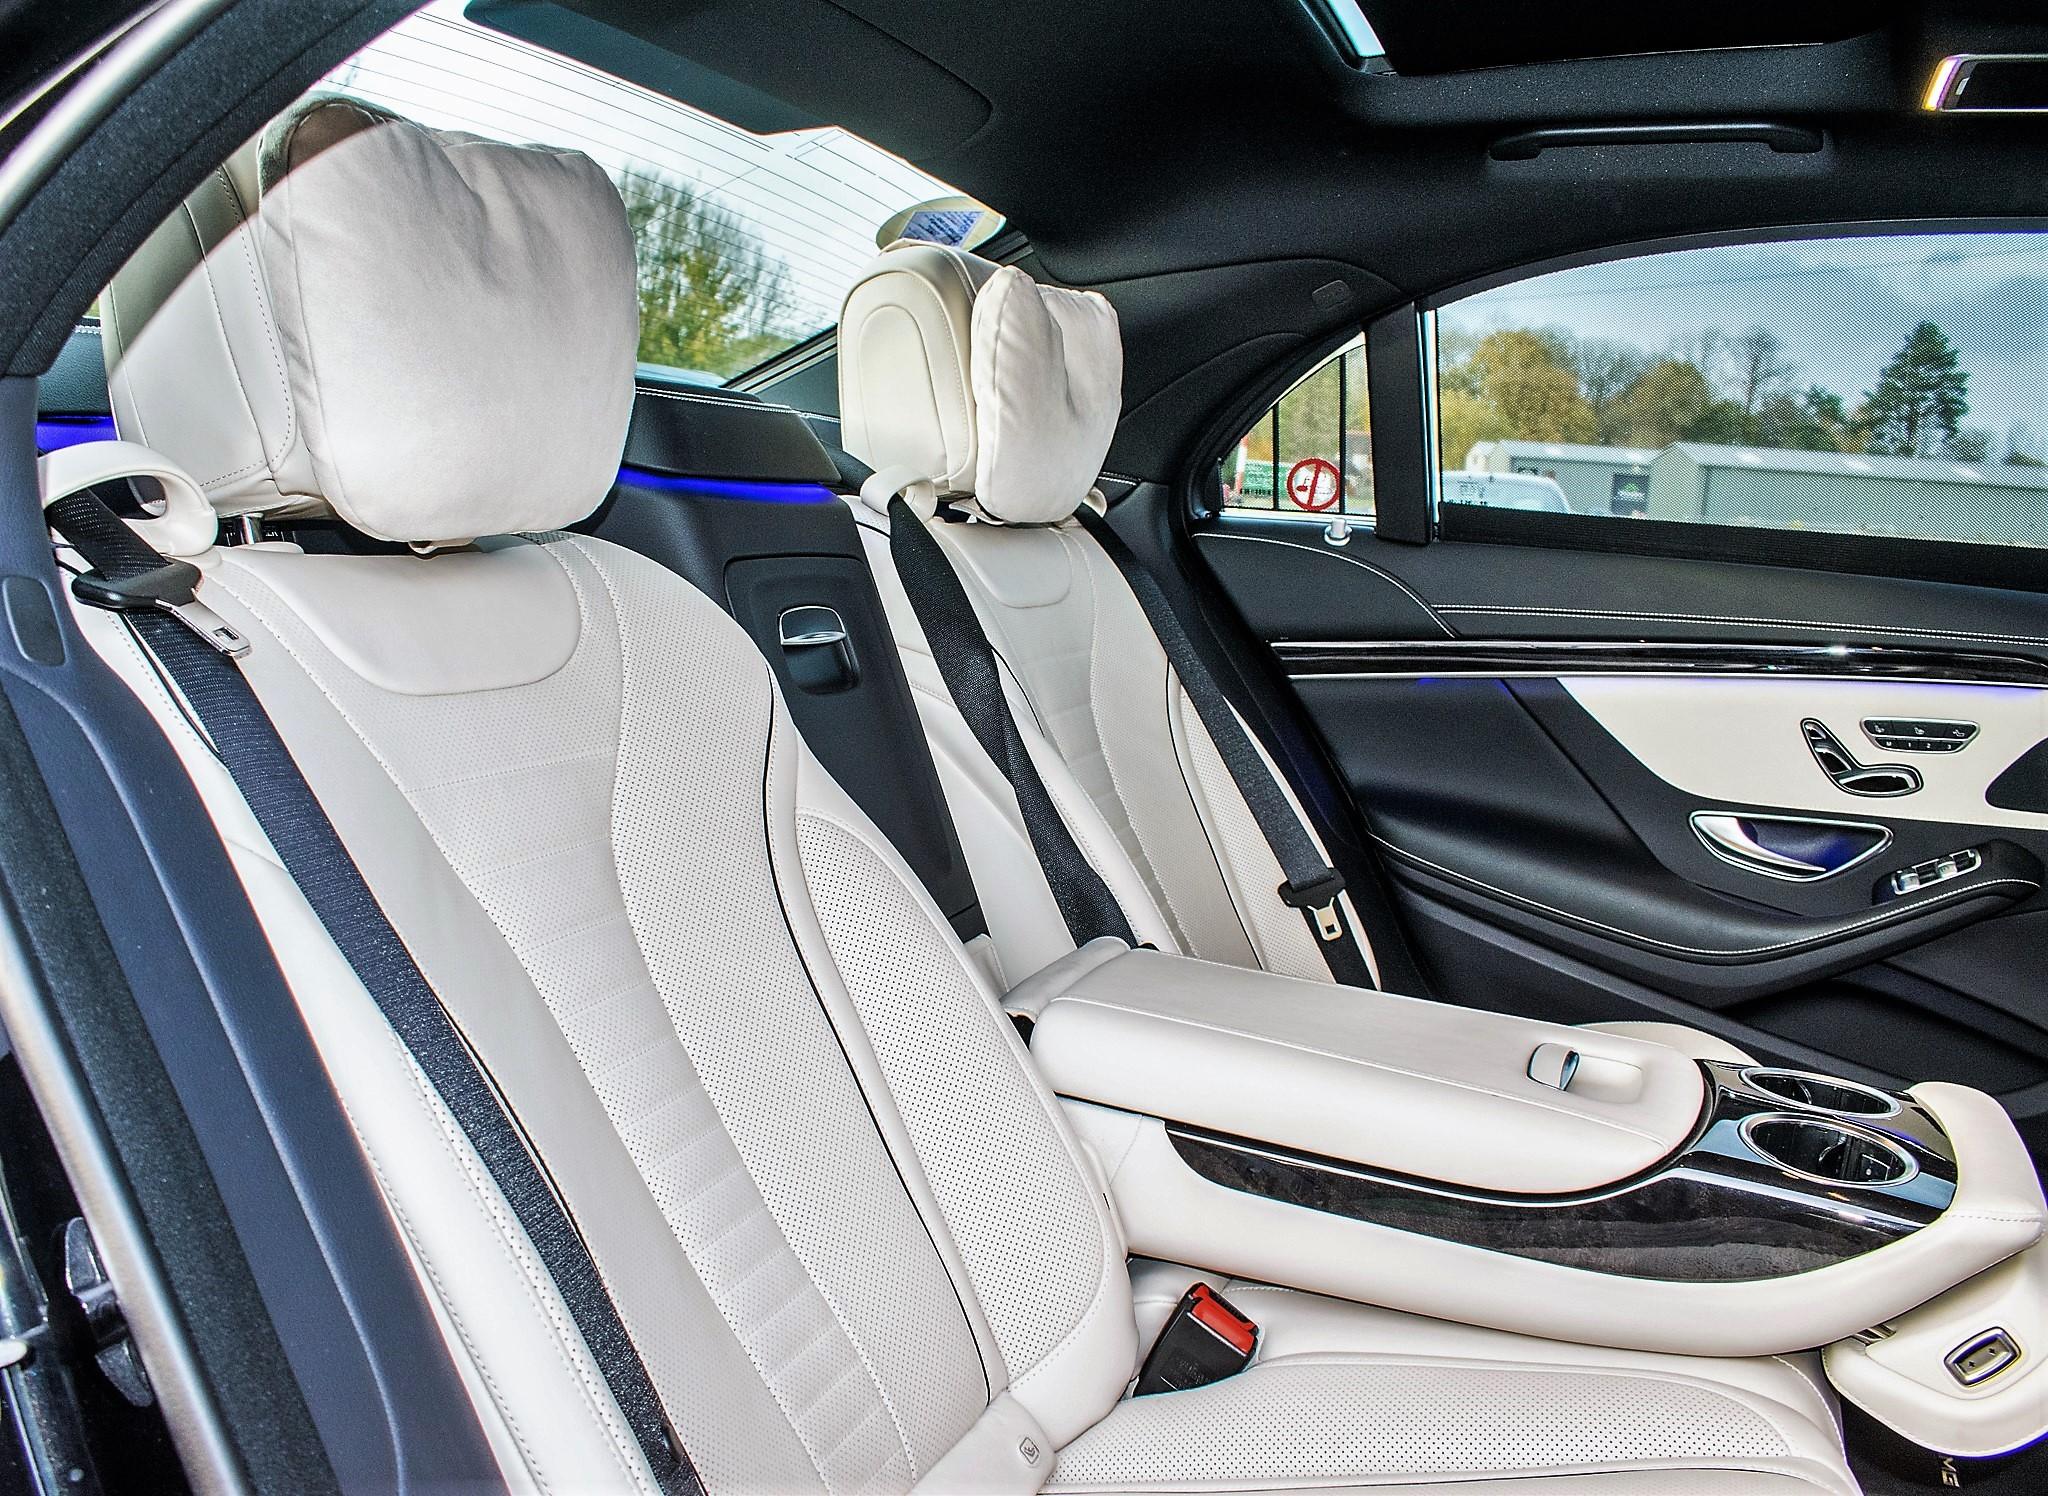 Mercedes Benz S450 L AMG Line Executive auto petrol 4 door saloon car Registration Number: FX68 - Image 25 of 33